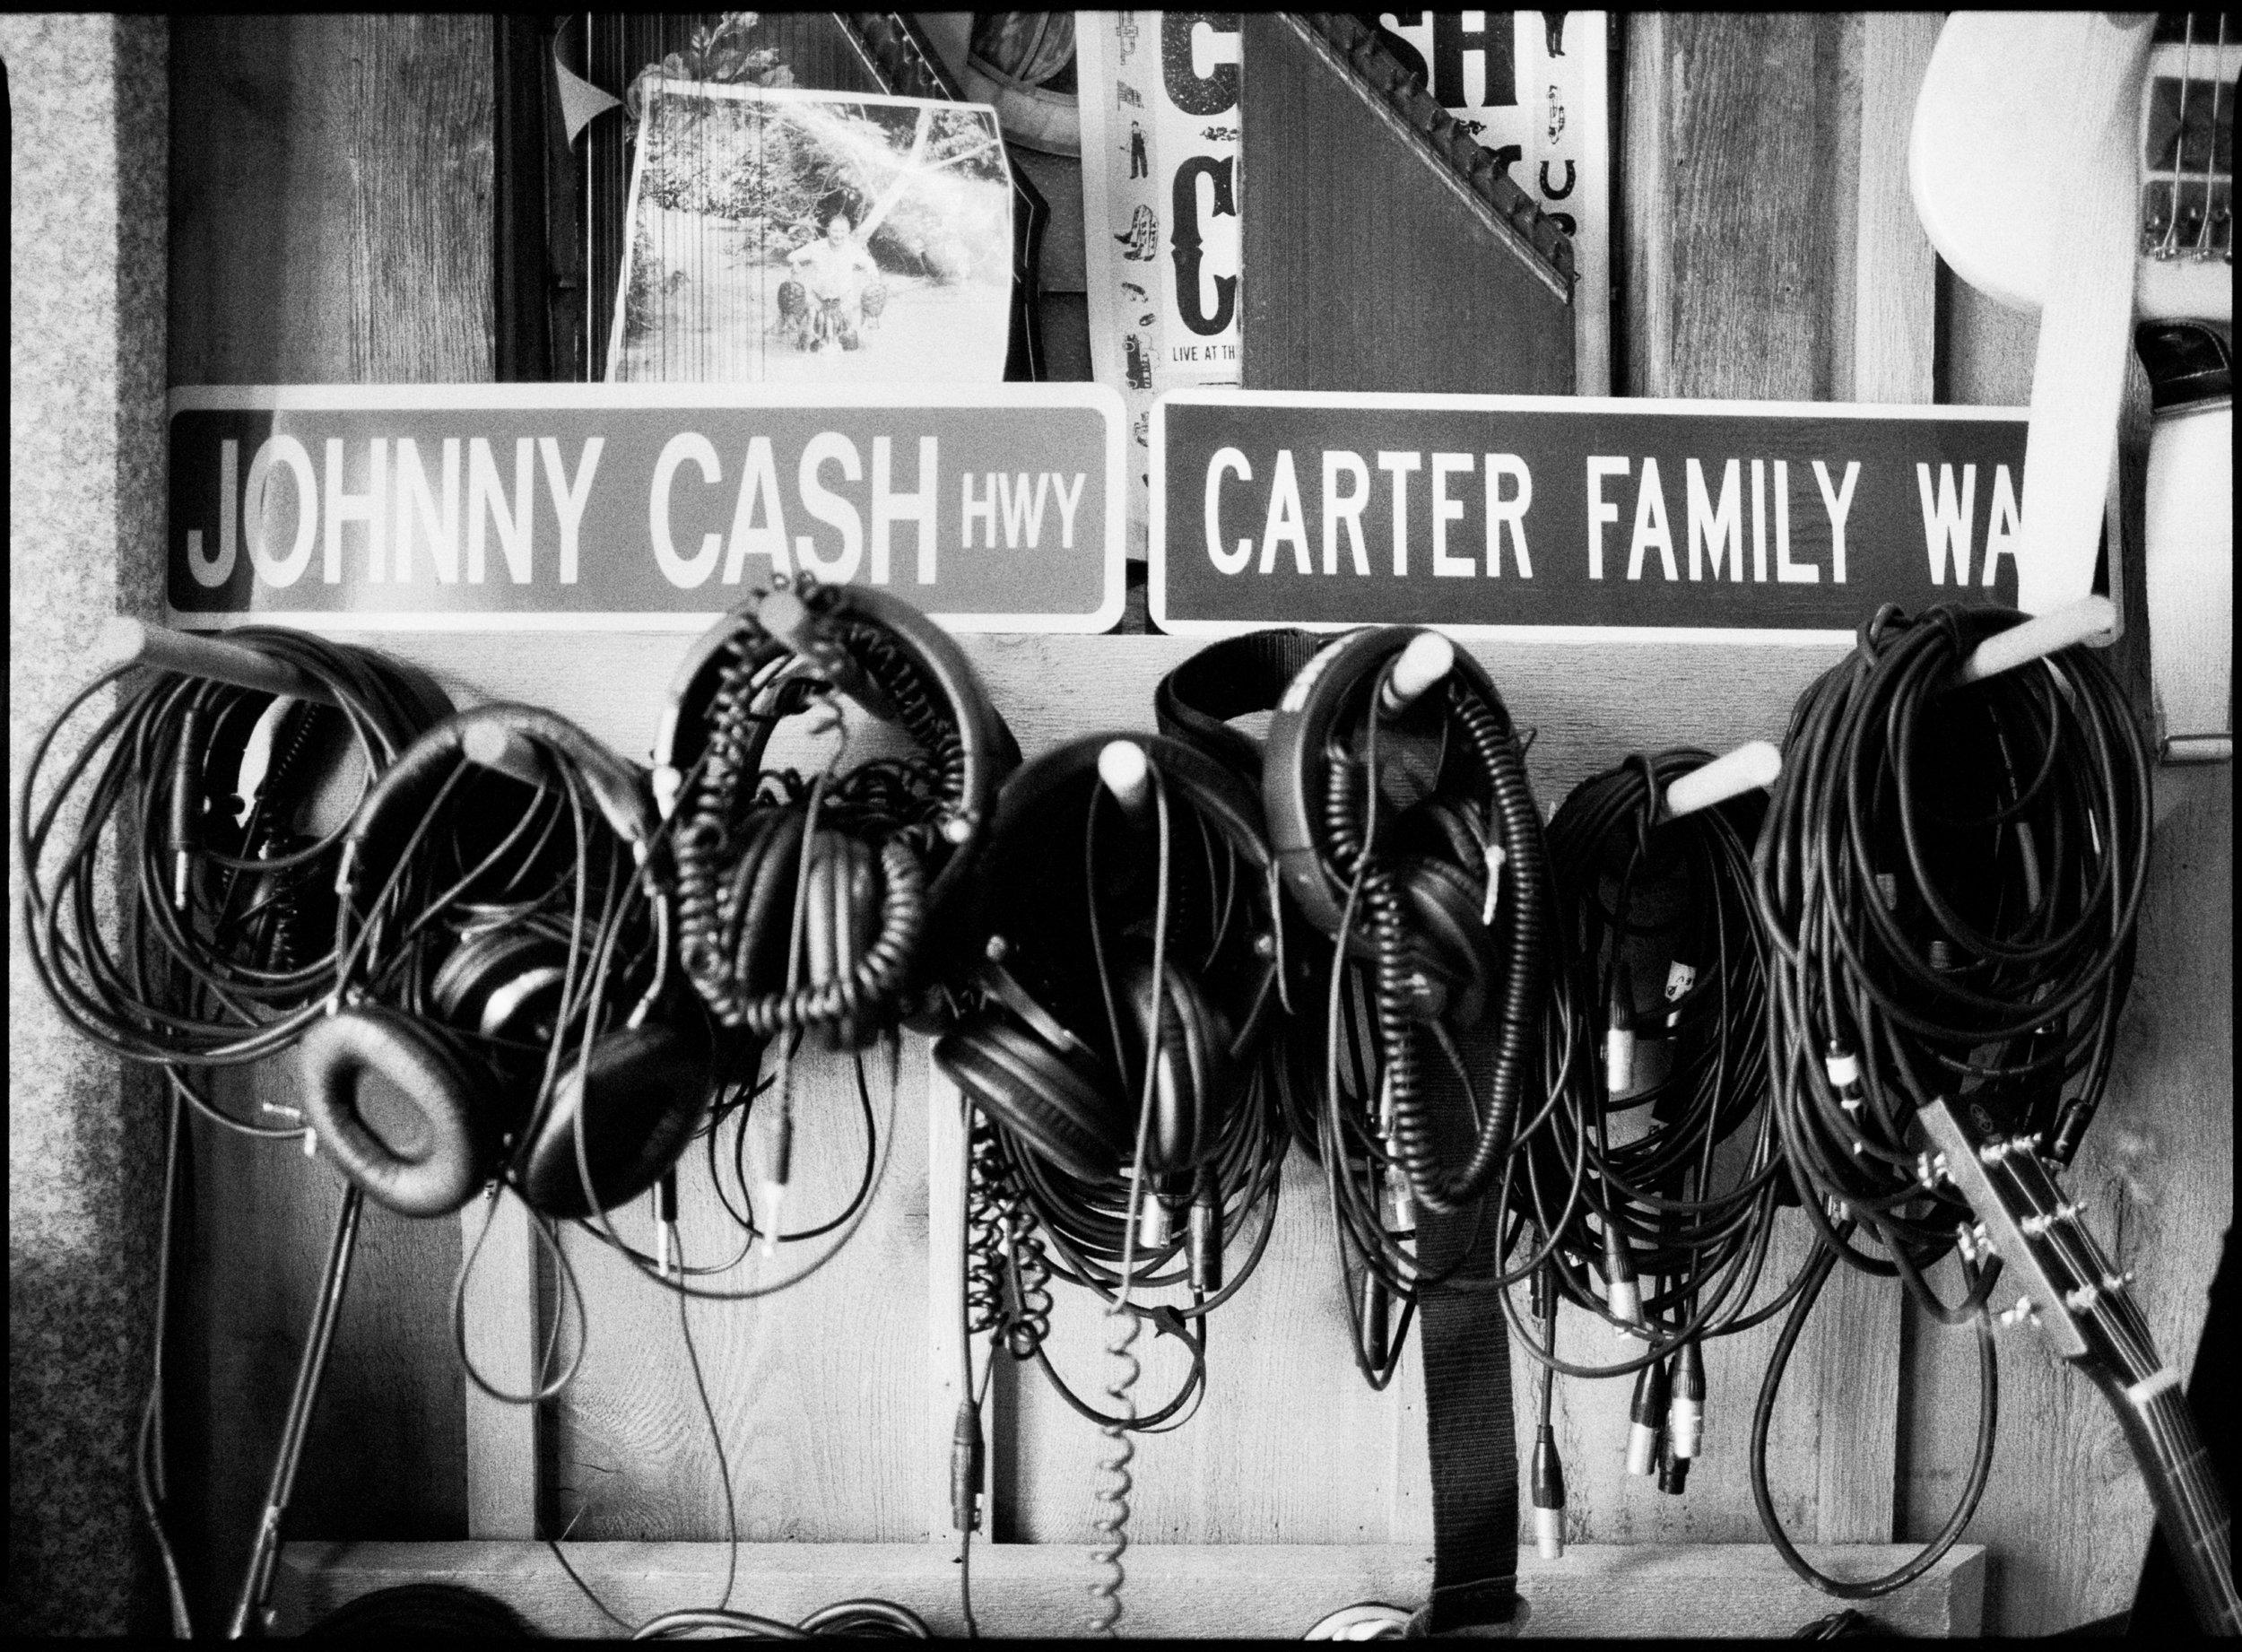 Cables and Headphones against Cash family memorabilia inside the studio.